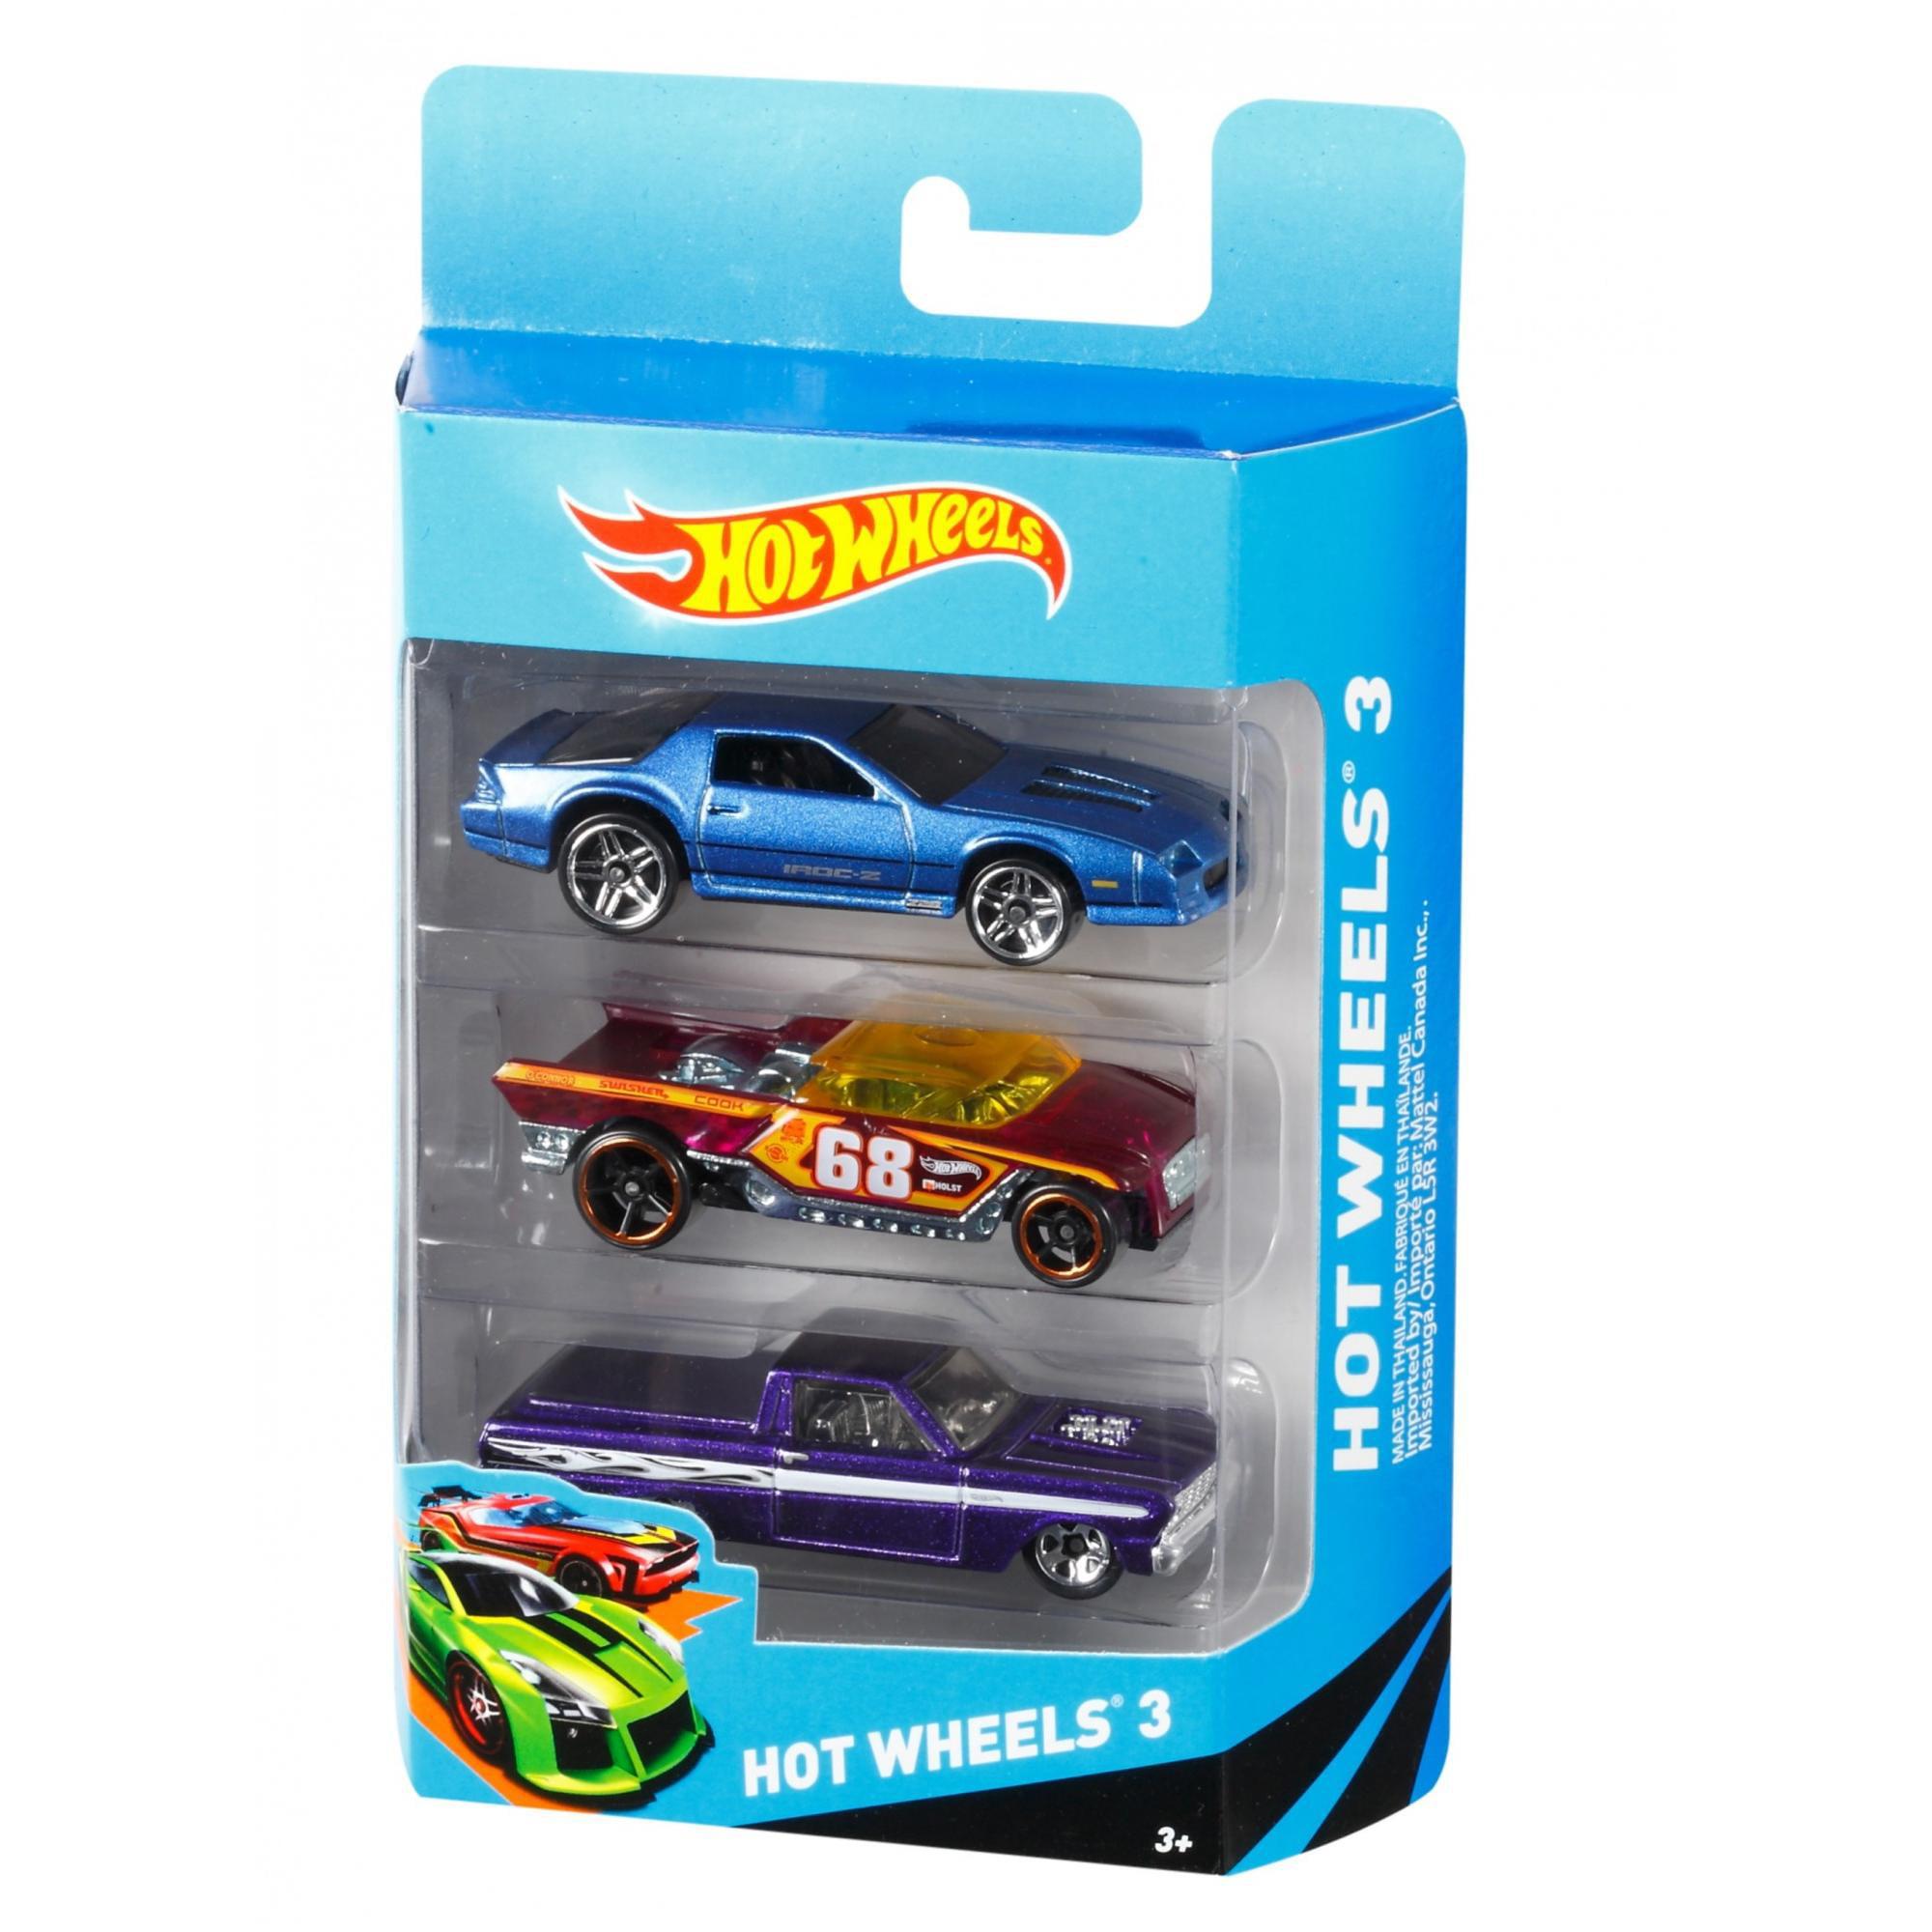 hot wheels 3 die cast car gift pack styles may vary walmartcom - Voitures Hot Wheels